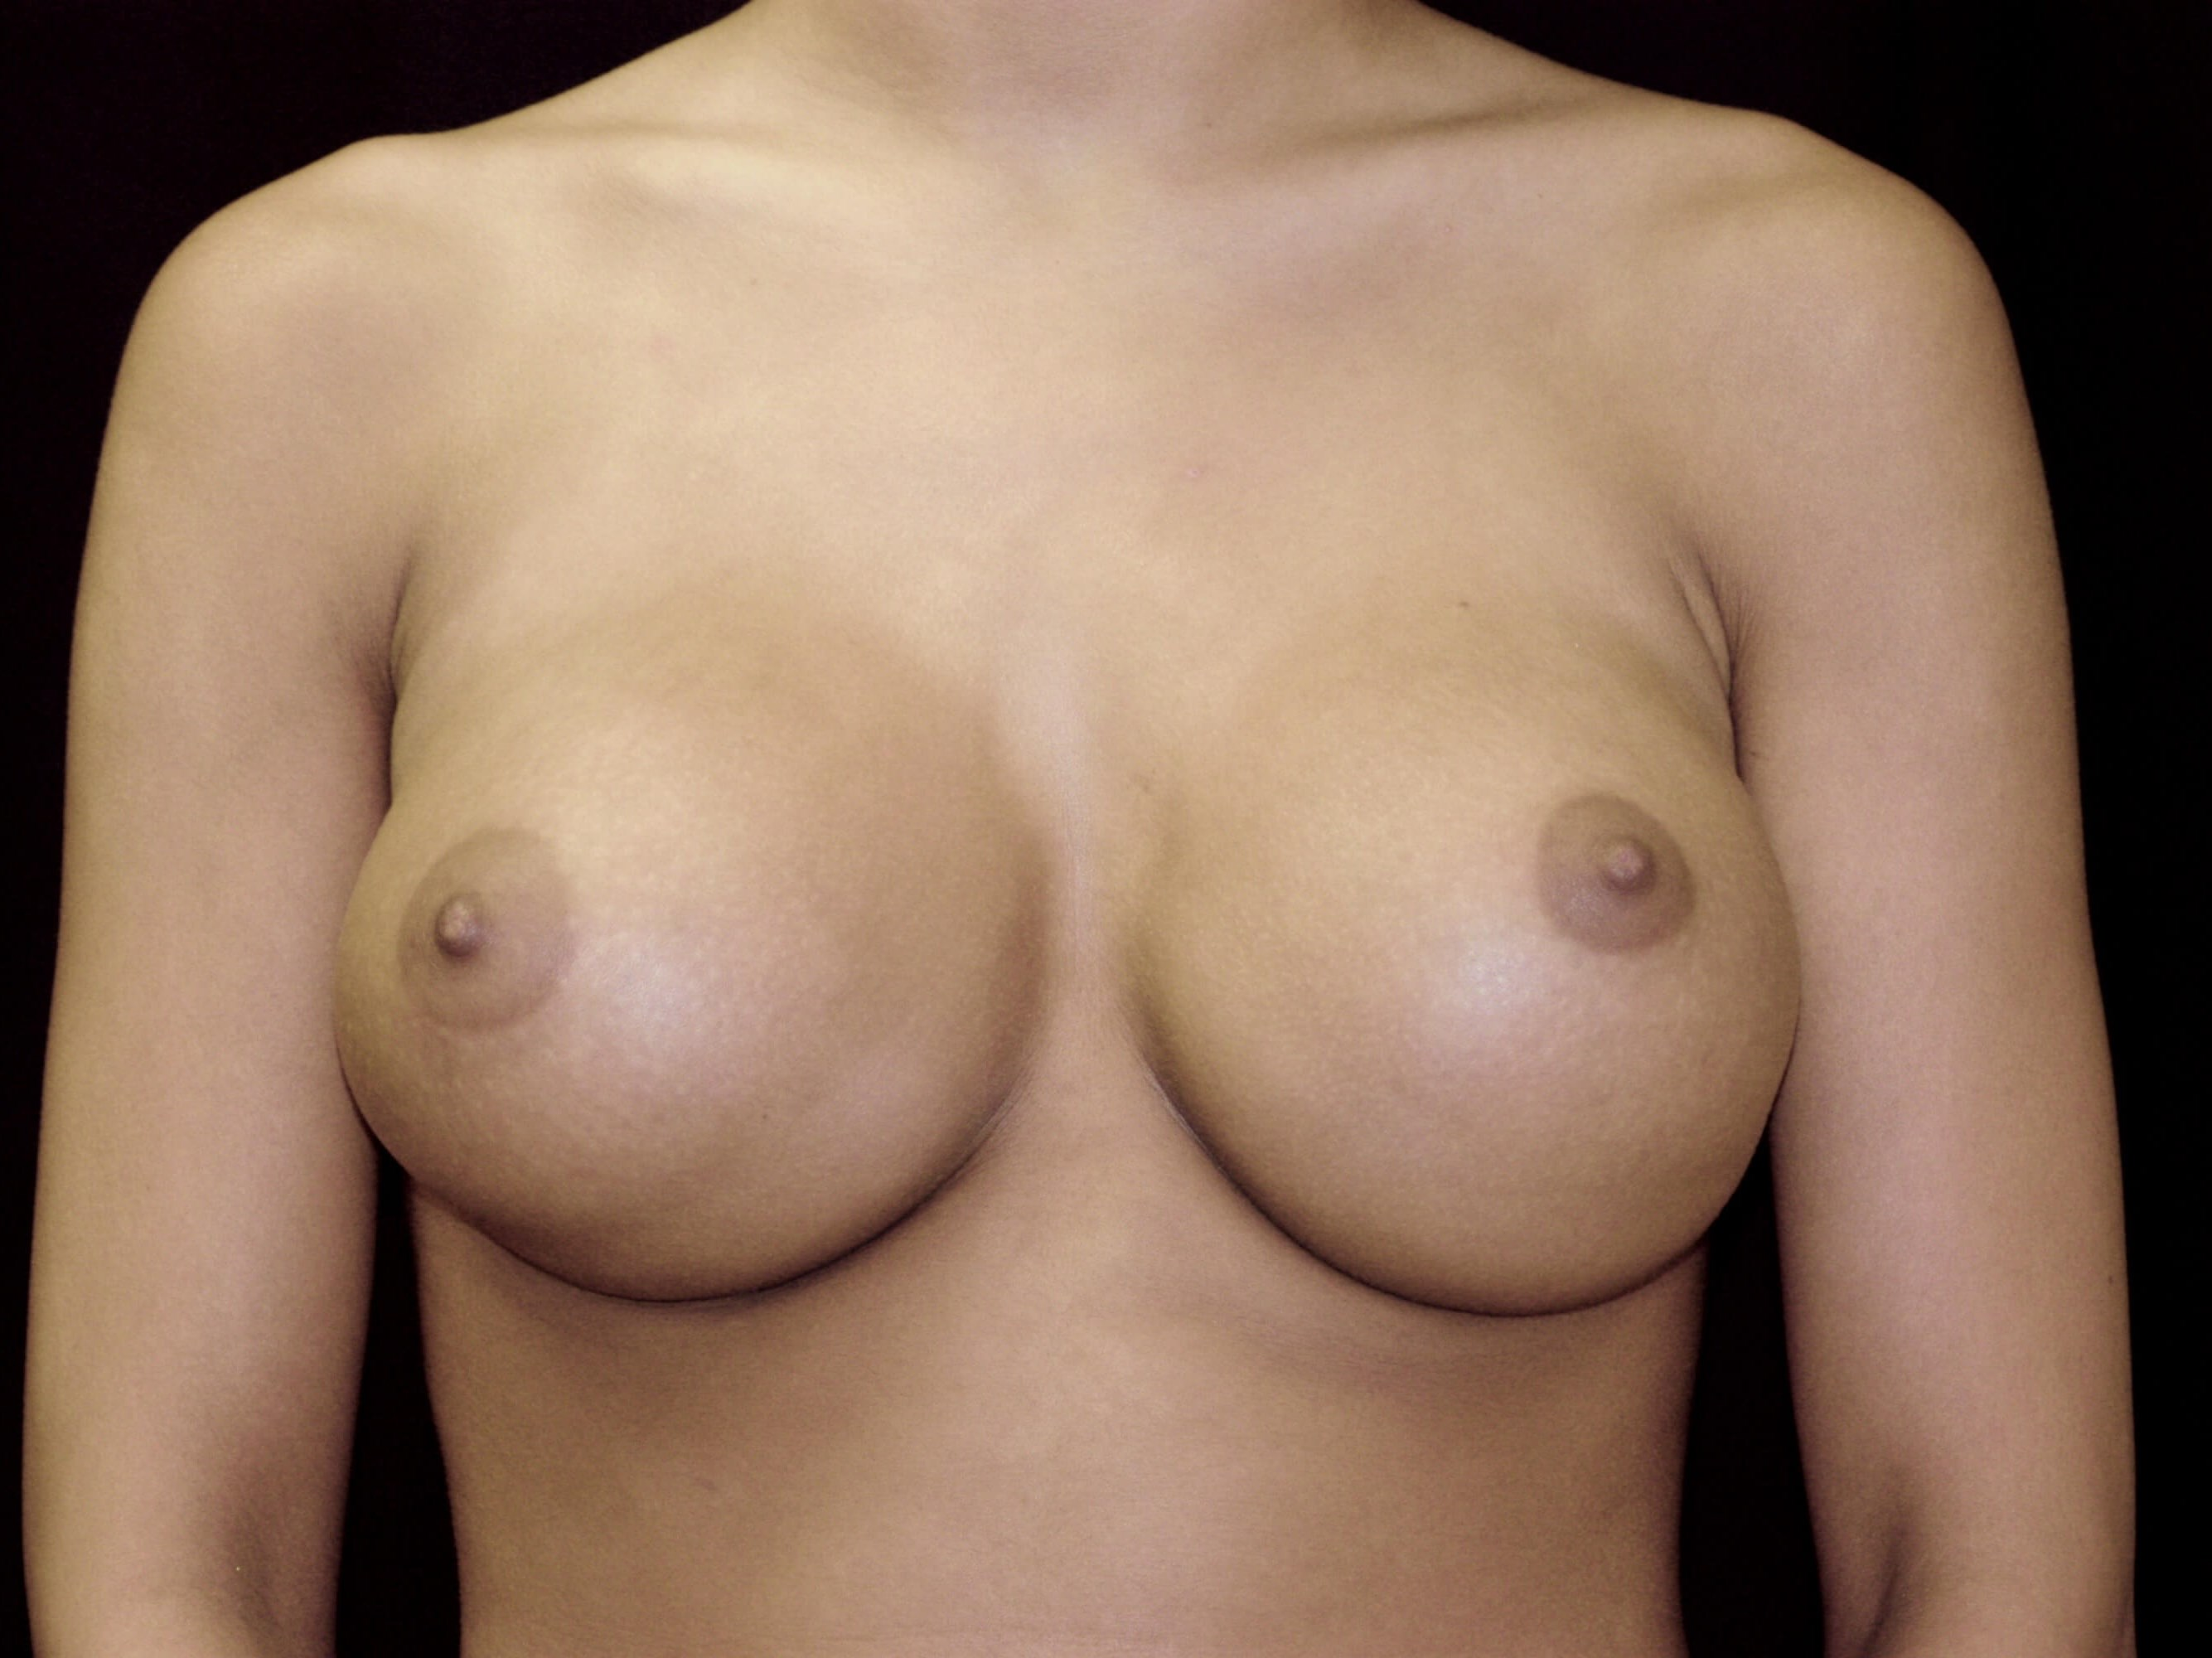 DALLAS WOMAN HAS DOUBLE BUBBLE BREAST IMPLANT CORRECTION